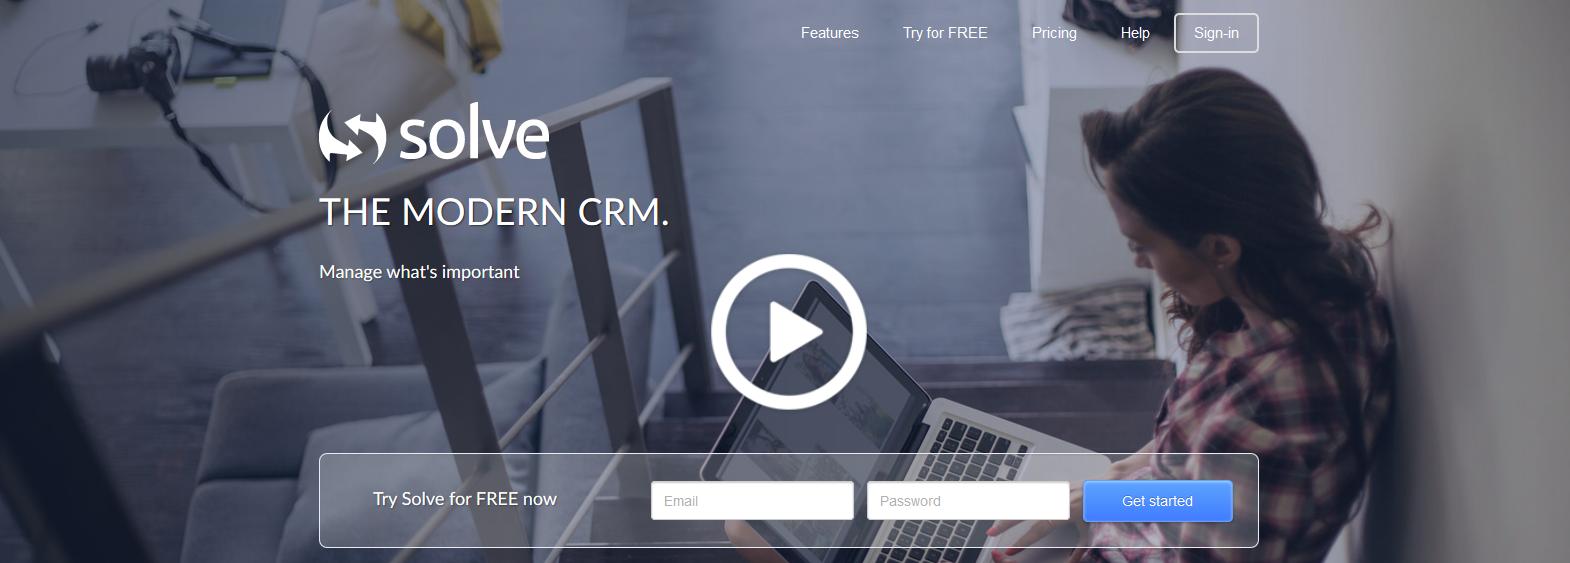 Solve CRM